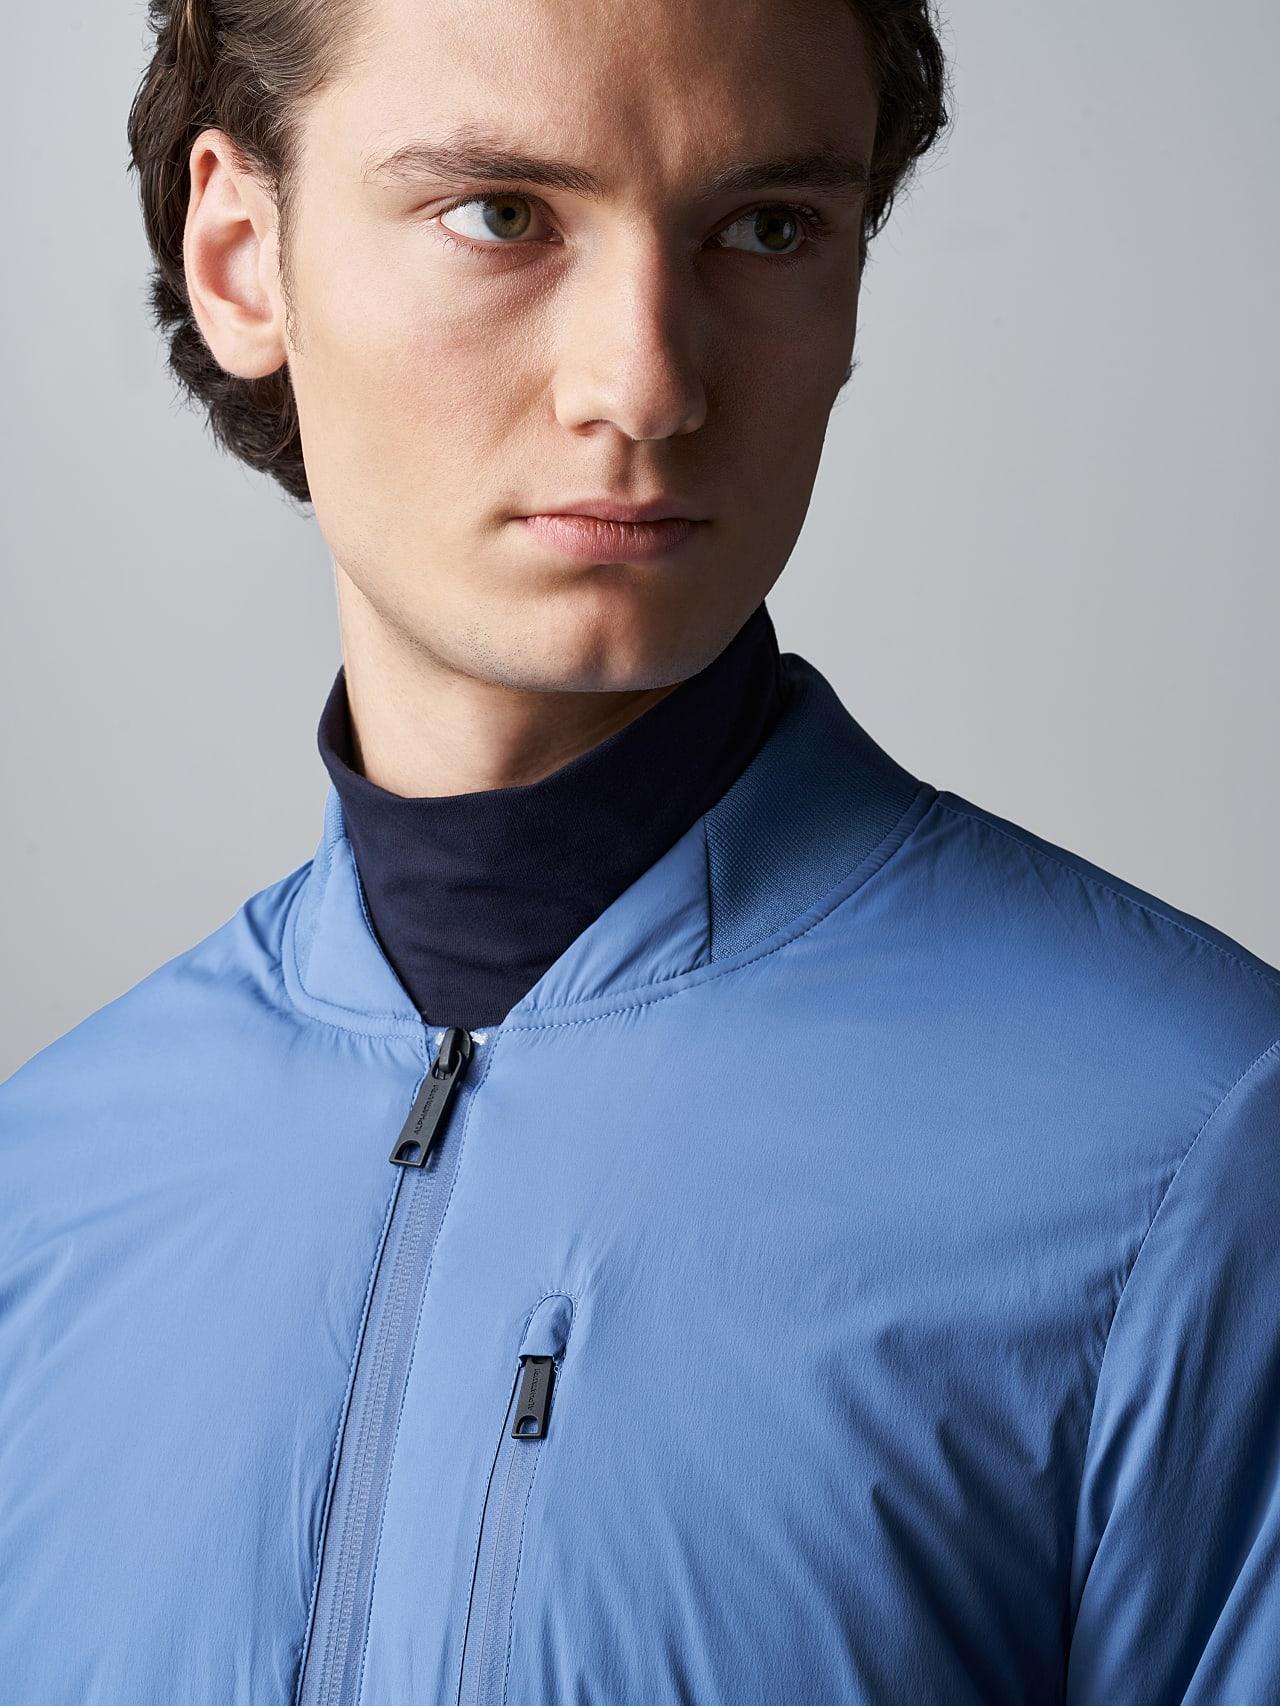 OPRIM V3.Y5.02 Padded PrimaLoft® Jacket light blue Right Alpha Tauri